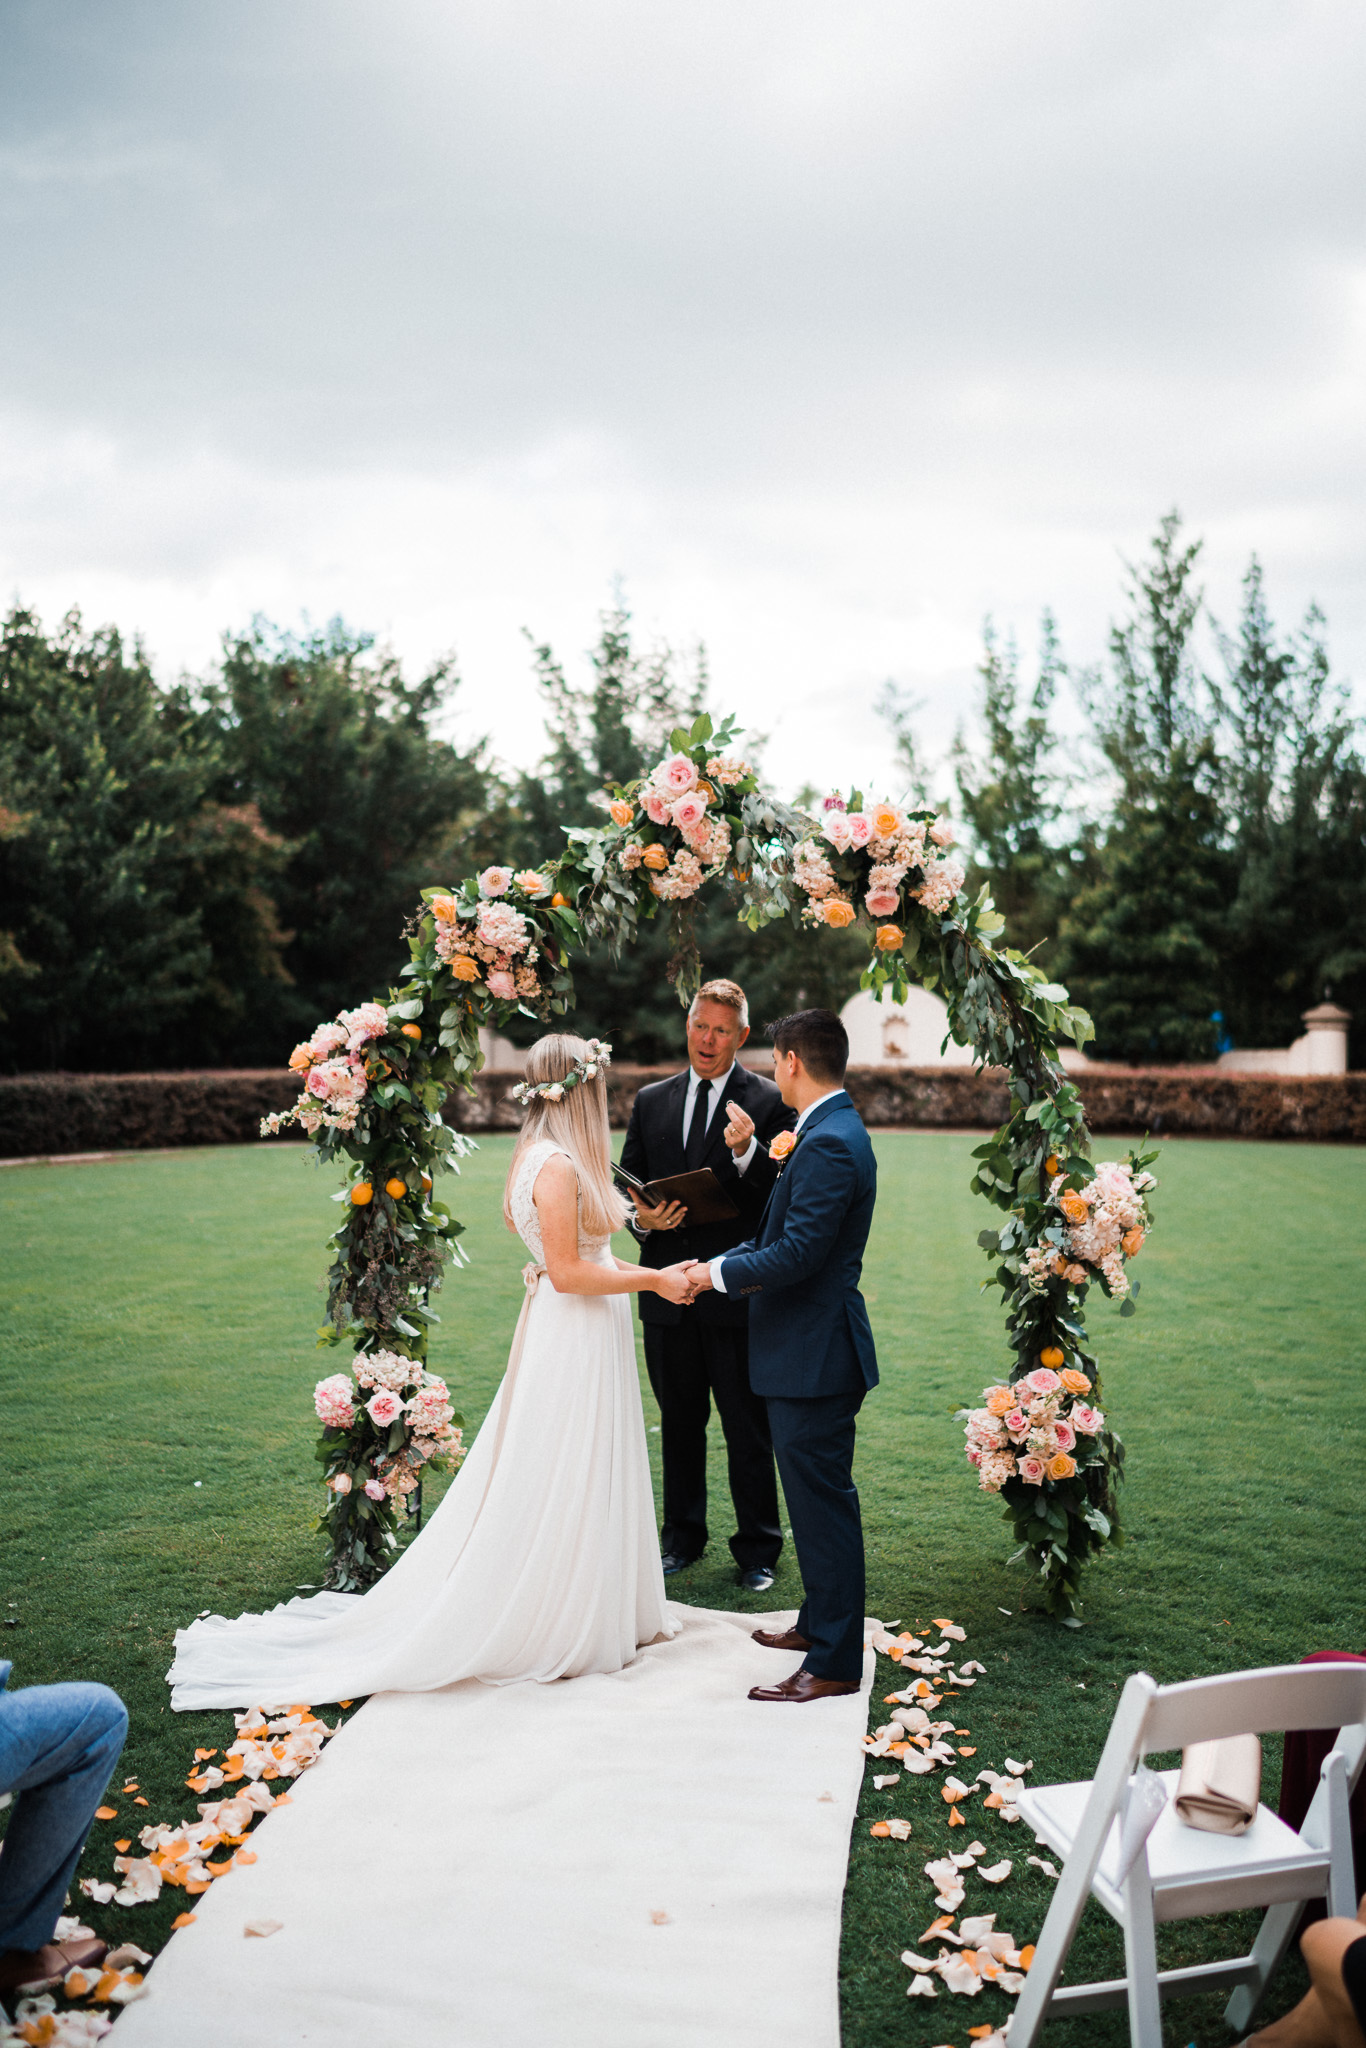 20180817_JerrySamantha_Wedding_RJ-21.jpg